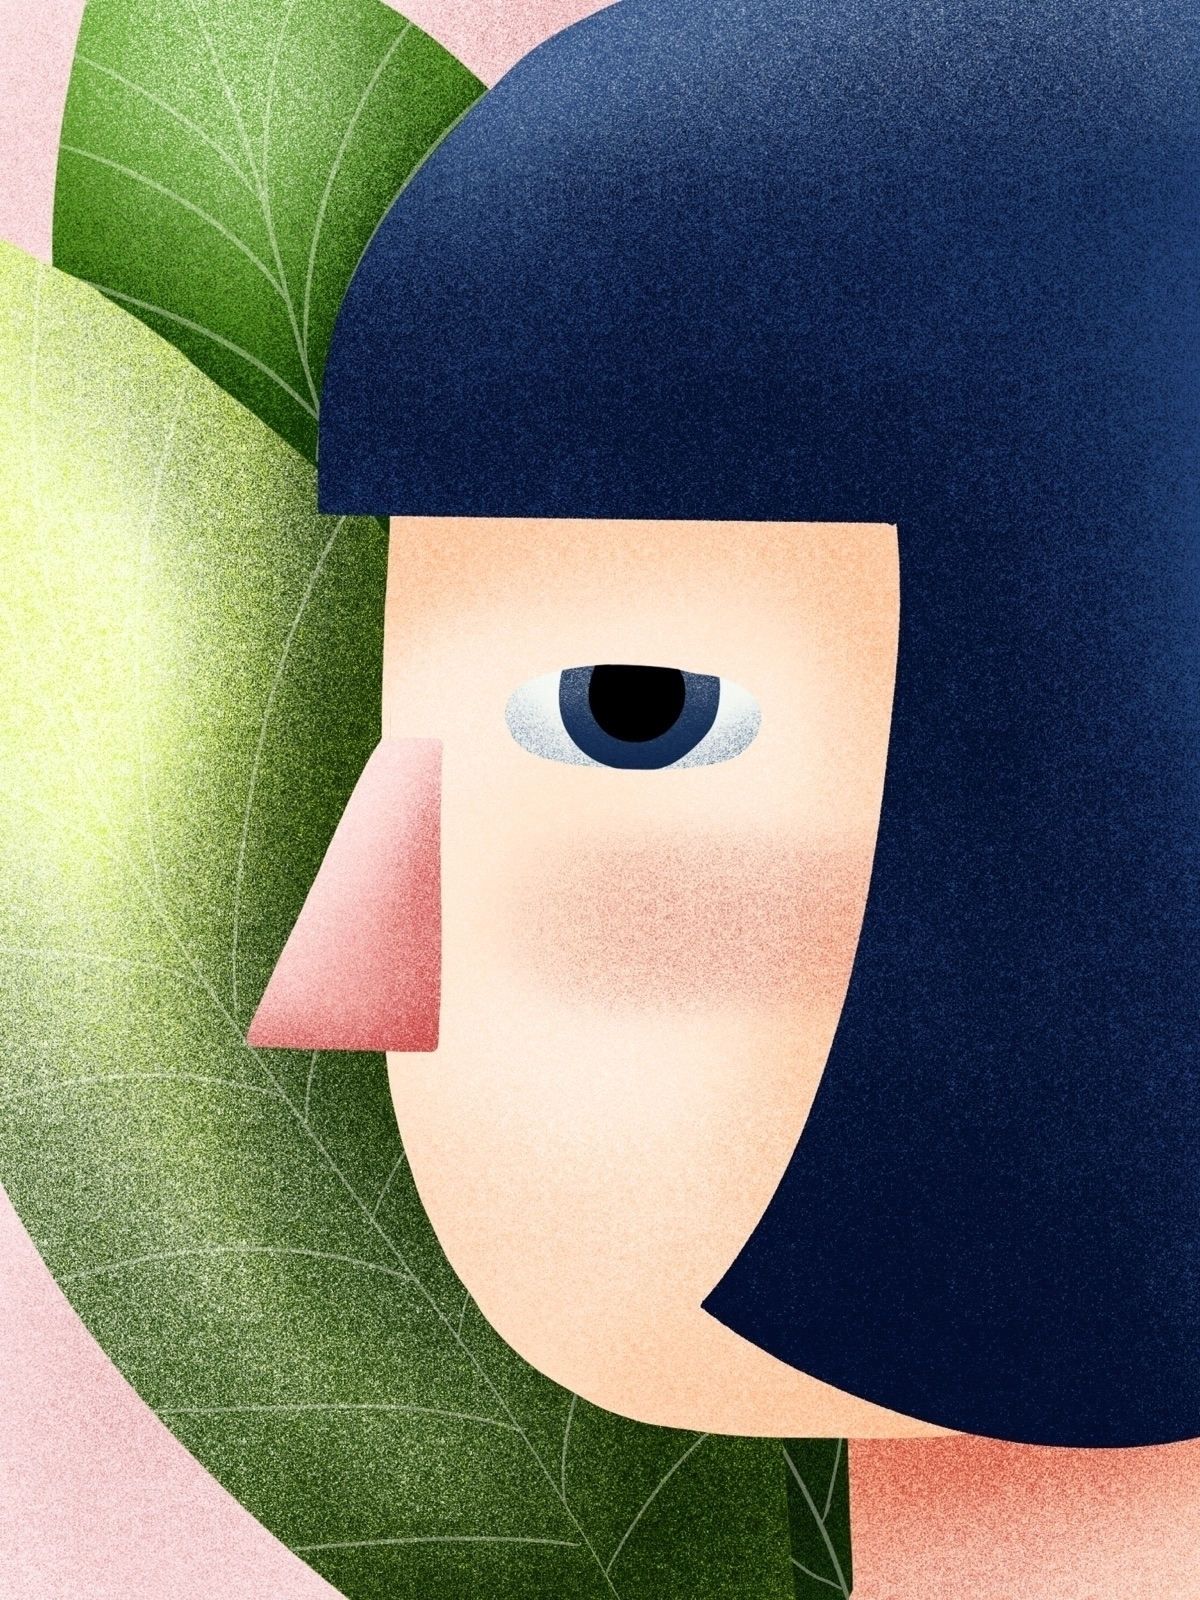 Bored girls loves plants - wip, green - juulstudio   ello